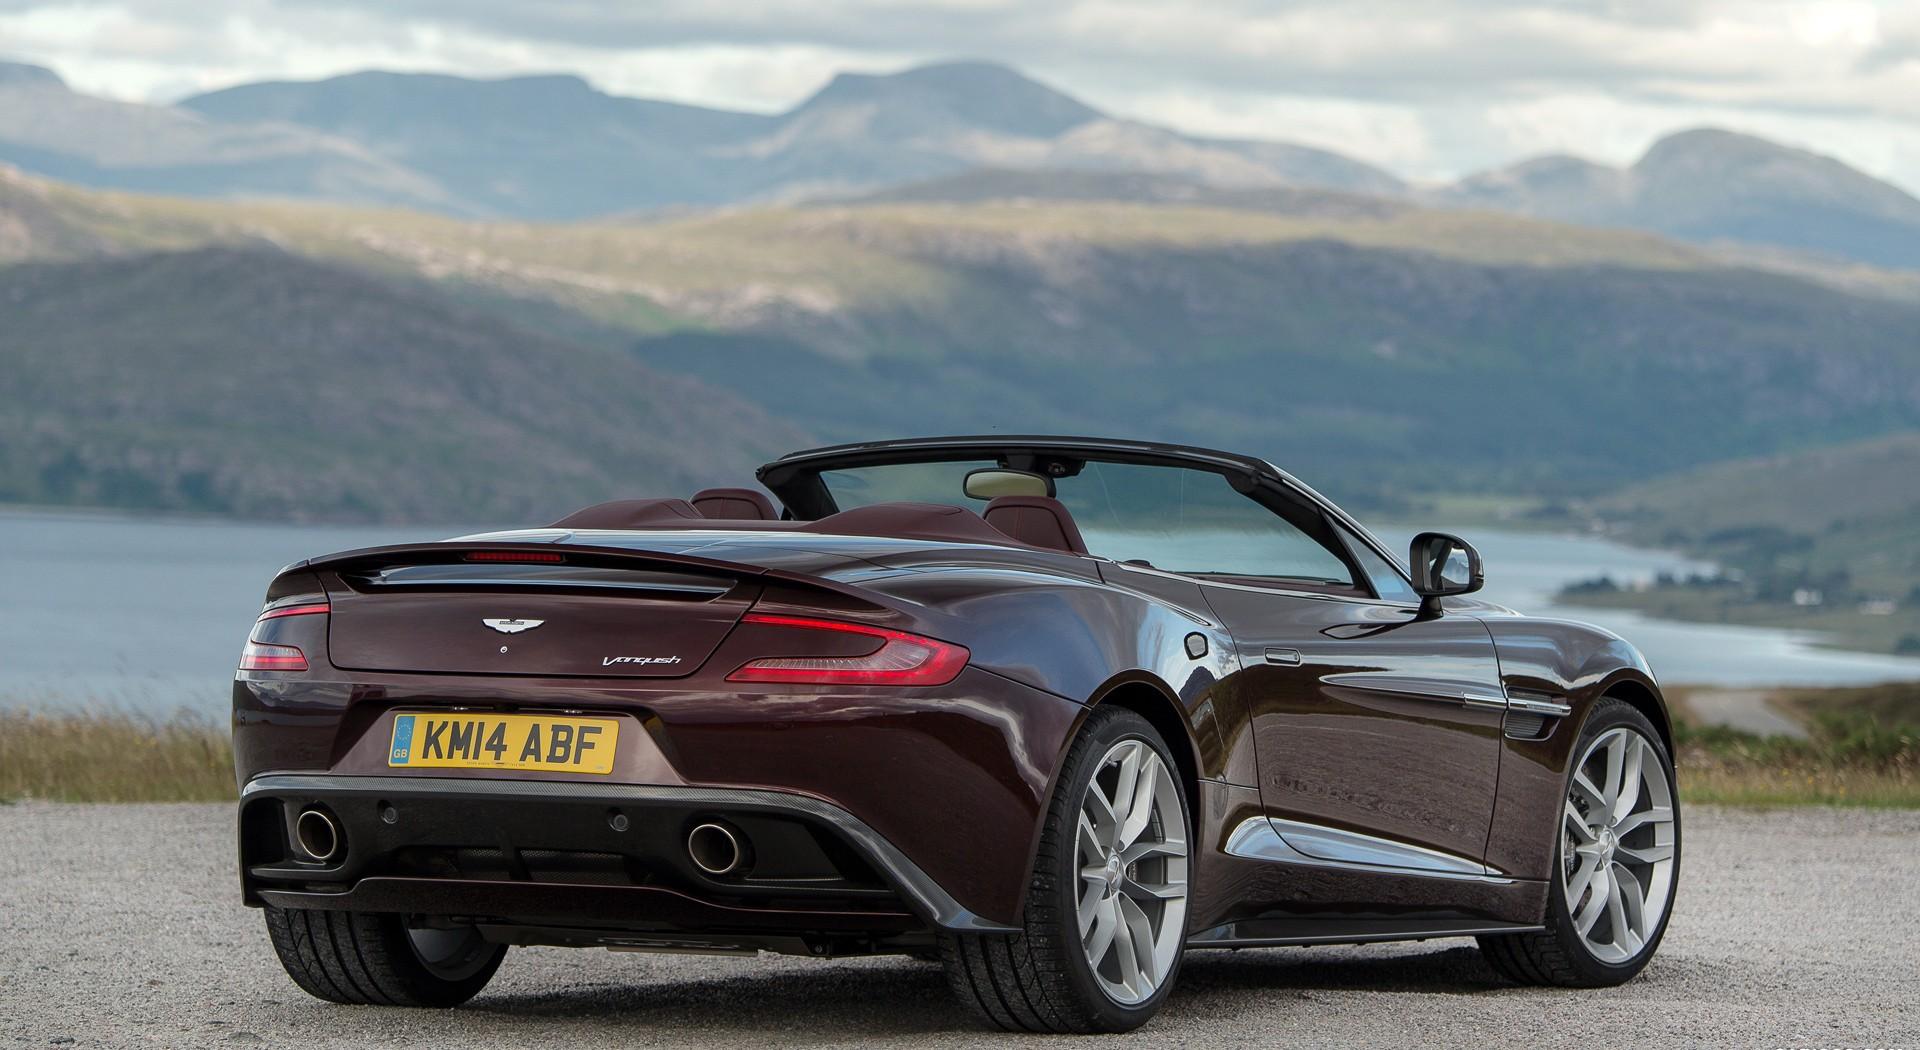 Aston Martin Vanquish volante A1